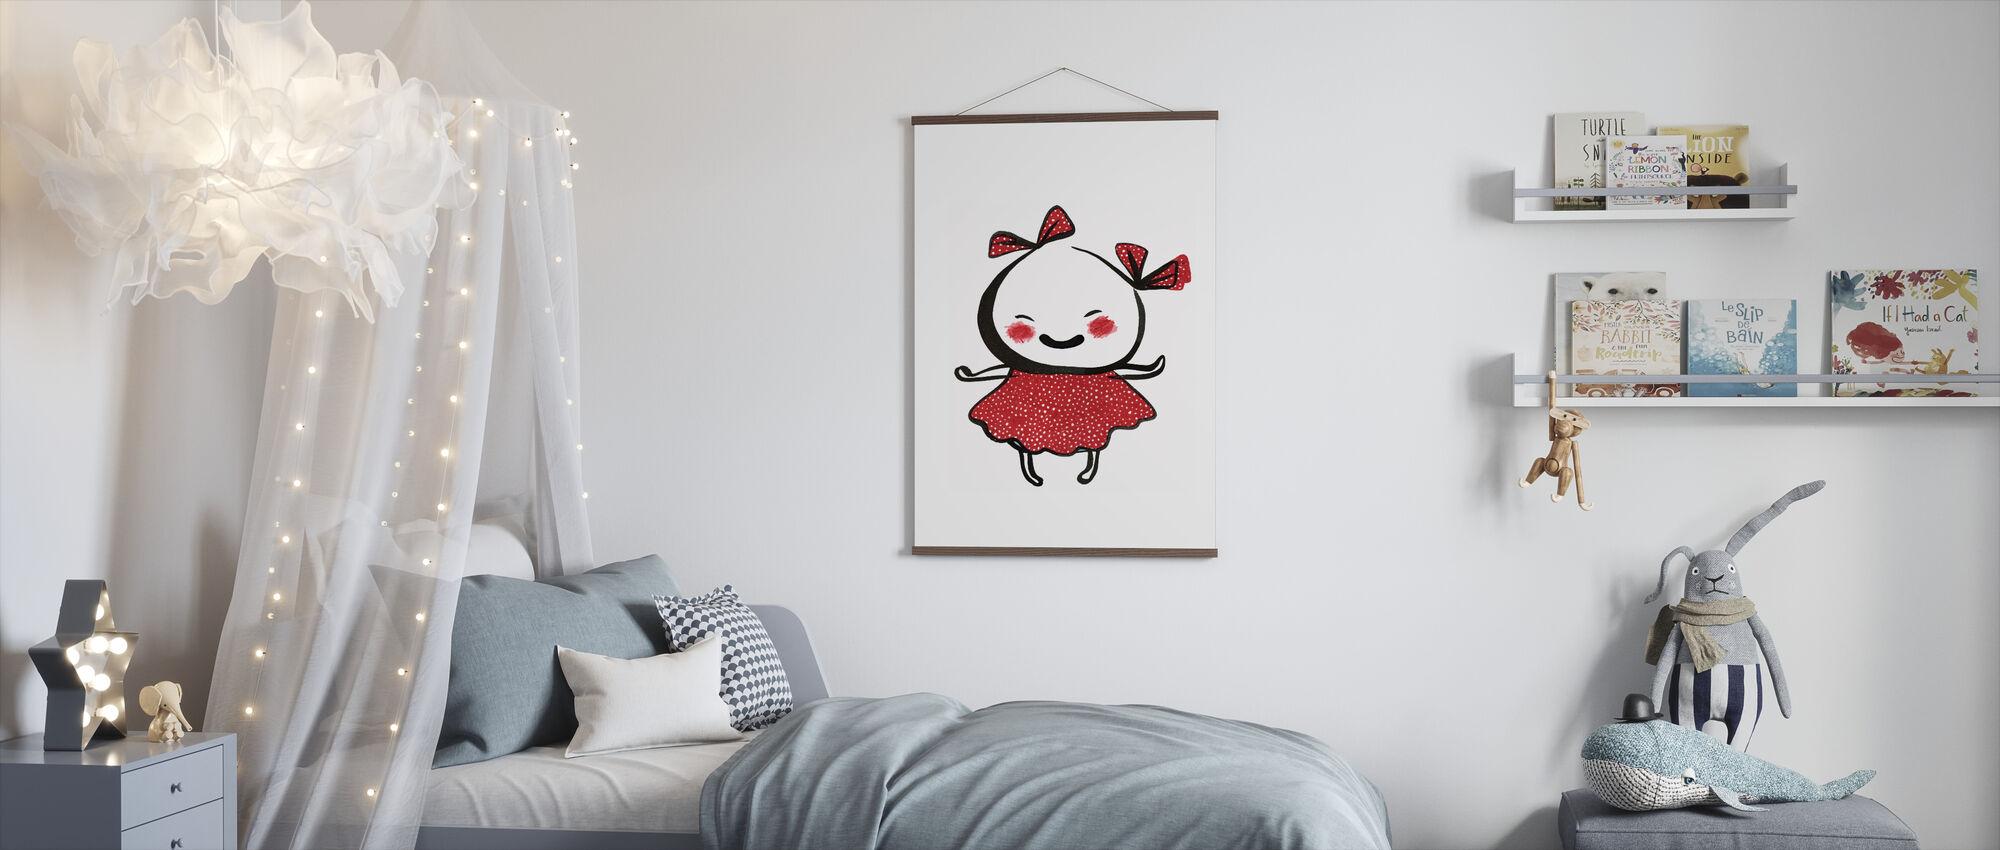 Mariko - Poster - Kids Room